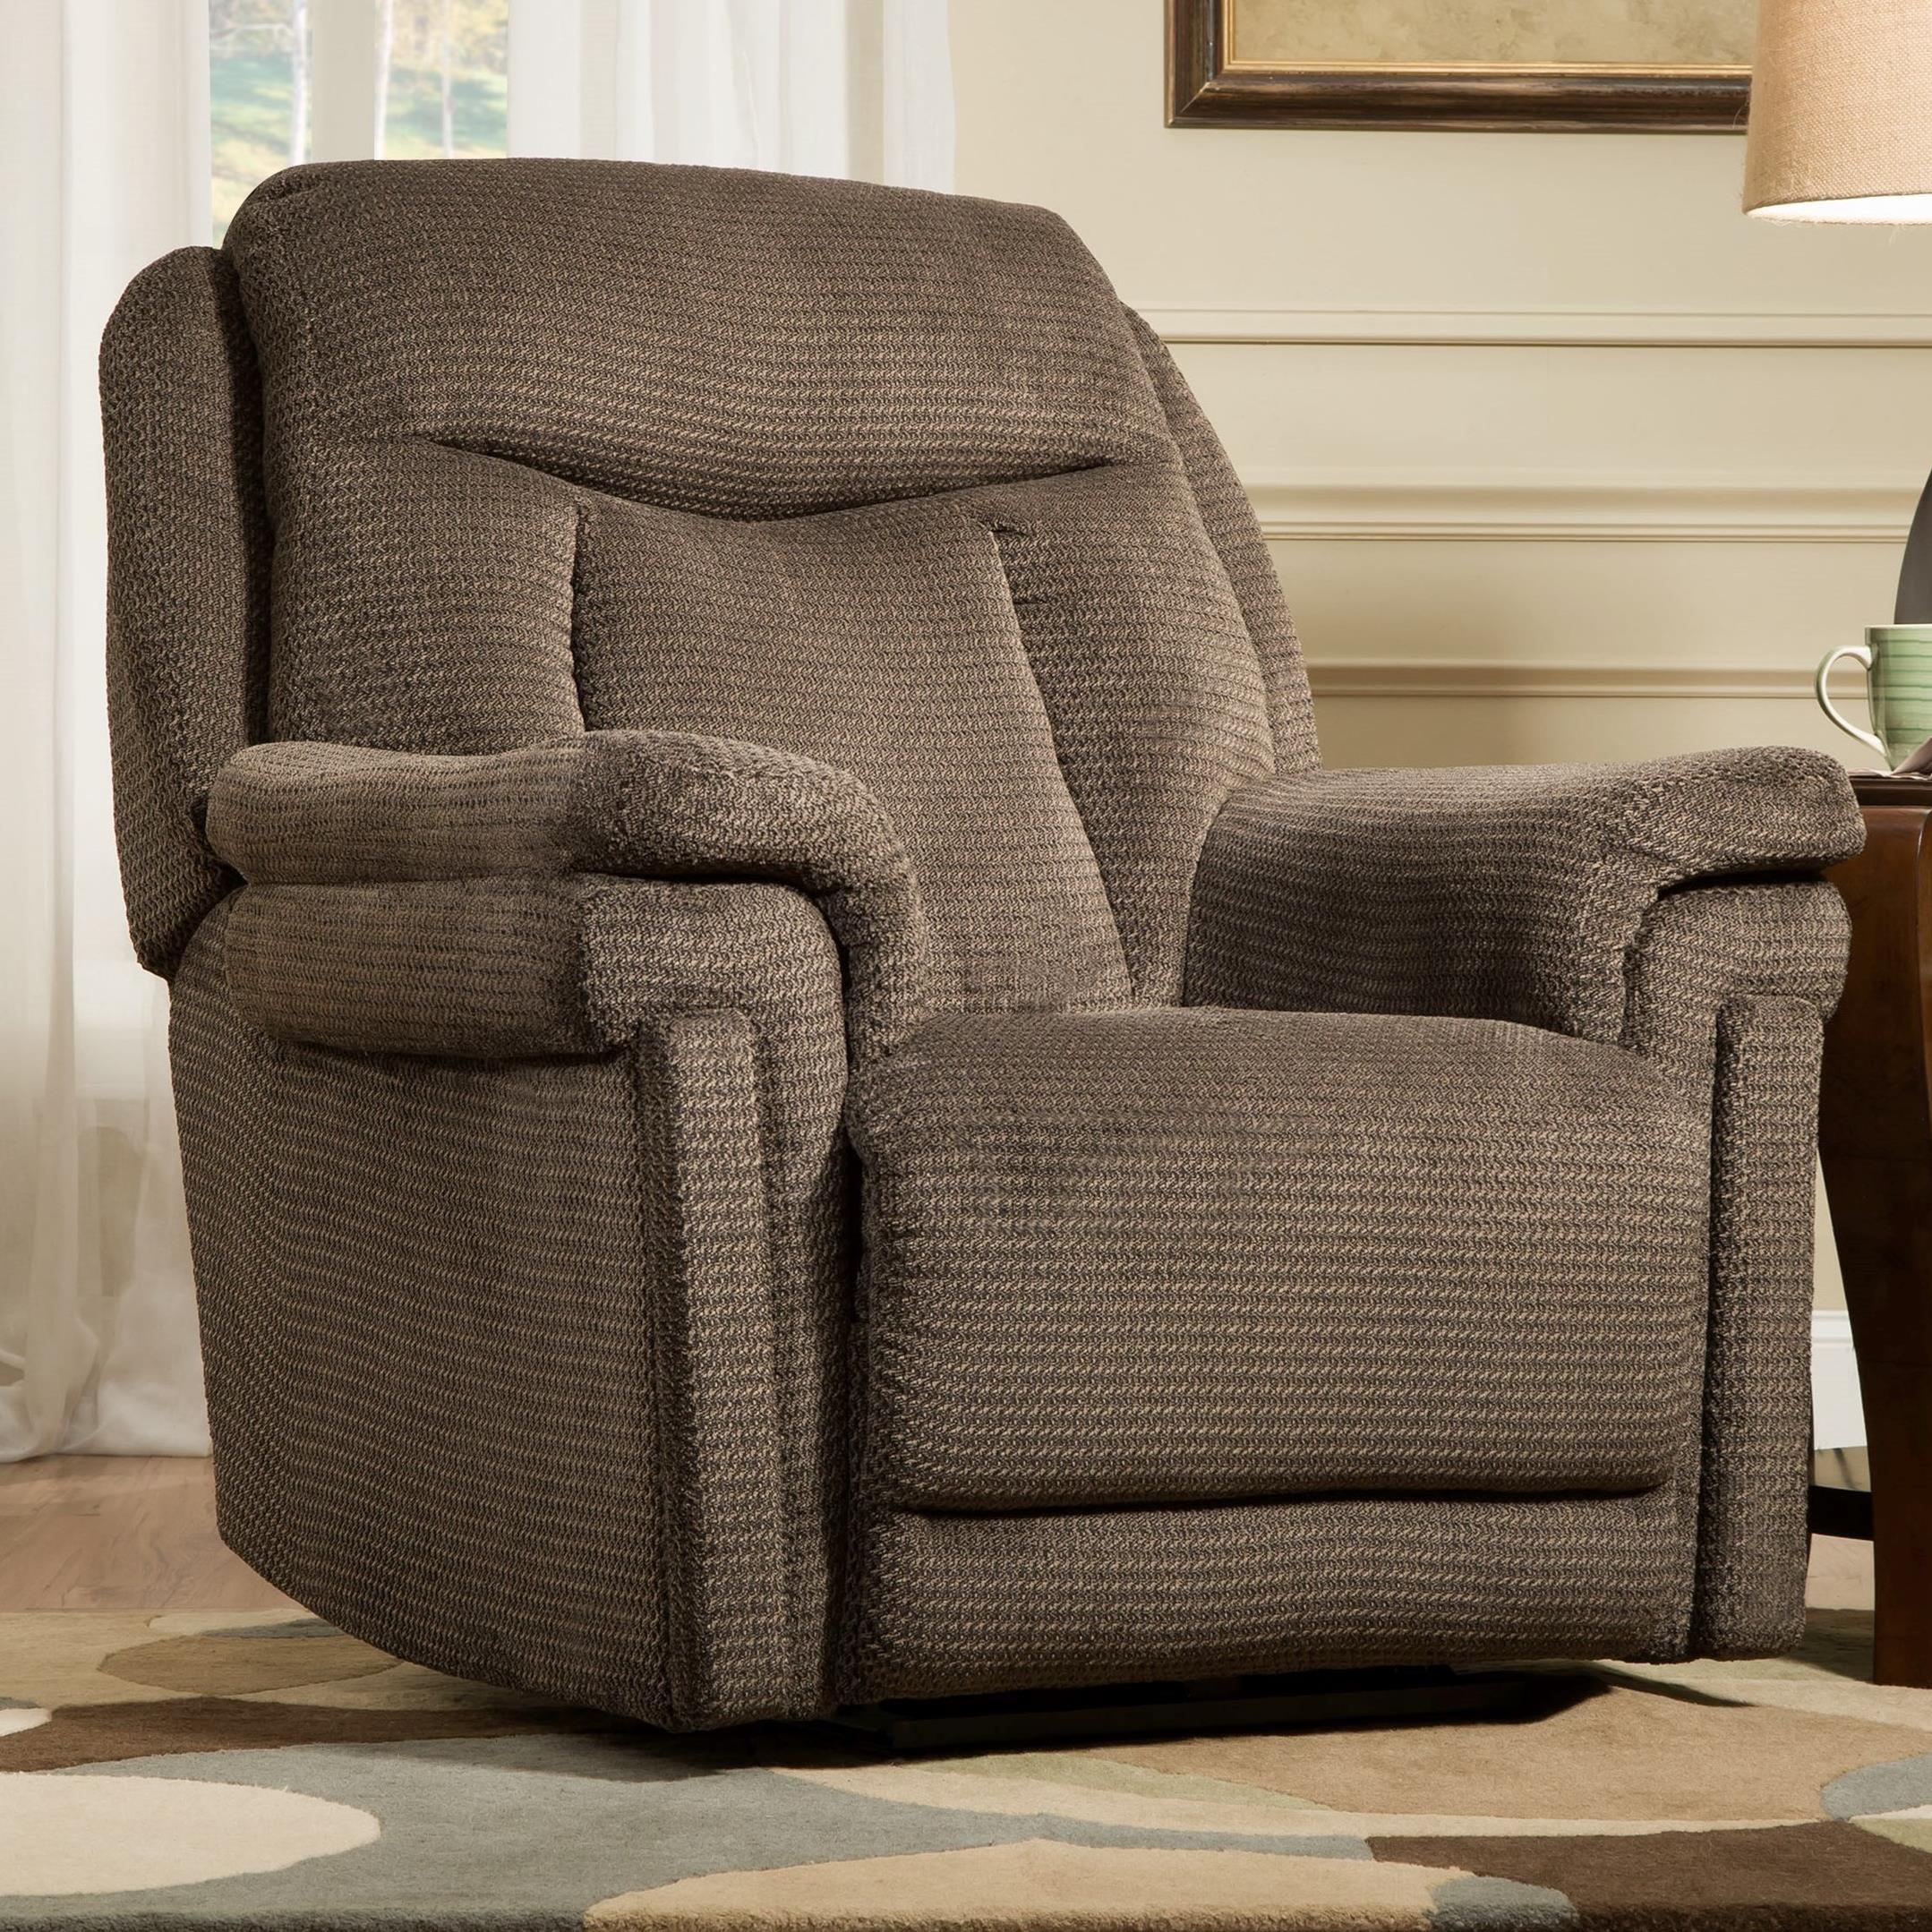 Bon Southern Motion ReclinersLayflat Lift Chair W/ Power Headrest